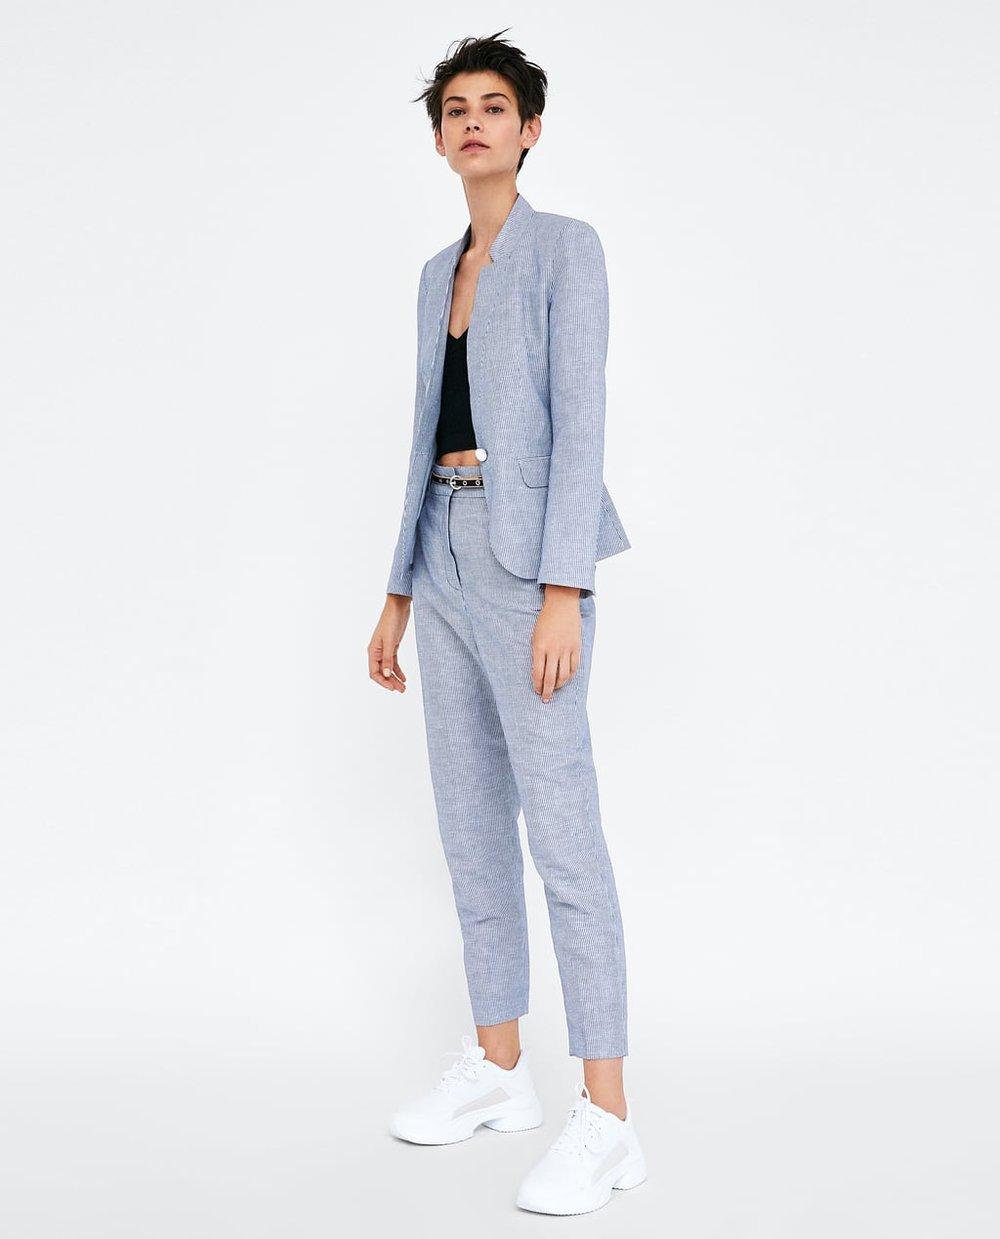 STRIPED PANTS WITH BELT. Zara. Was: $44. Now: $22.